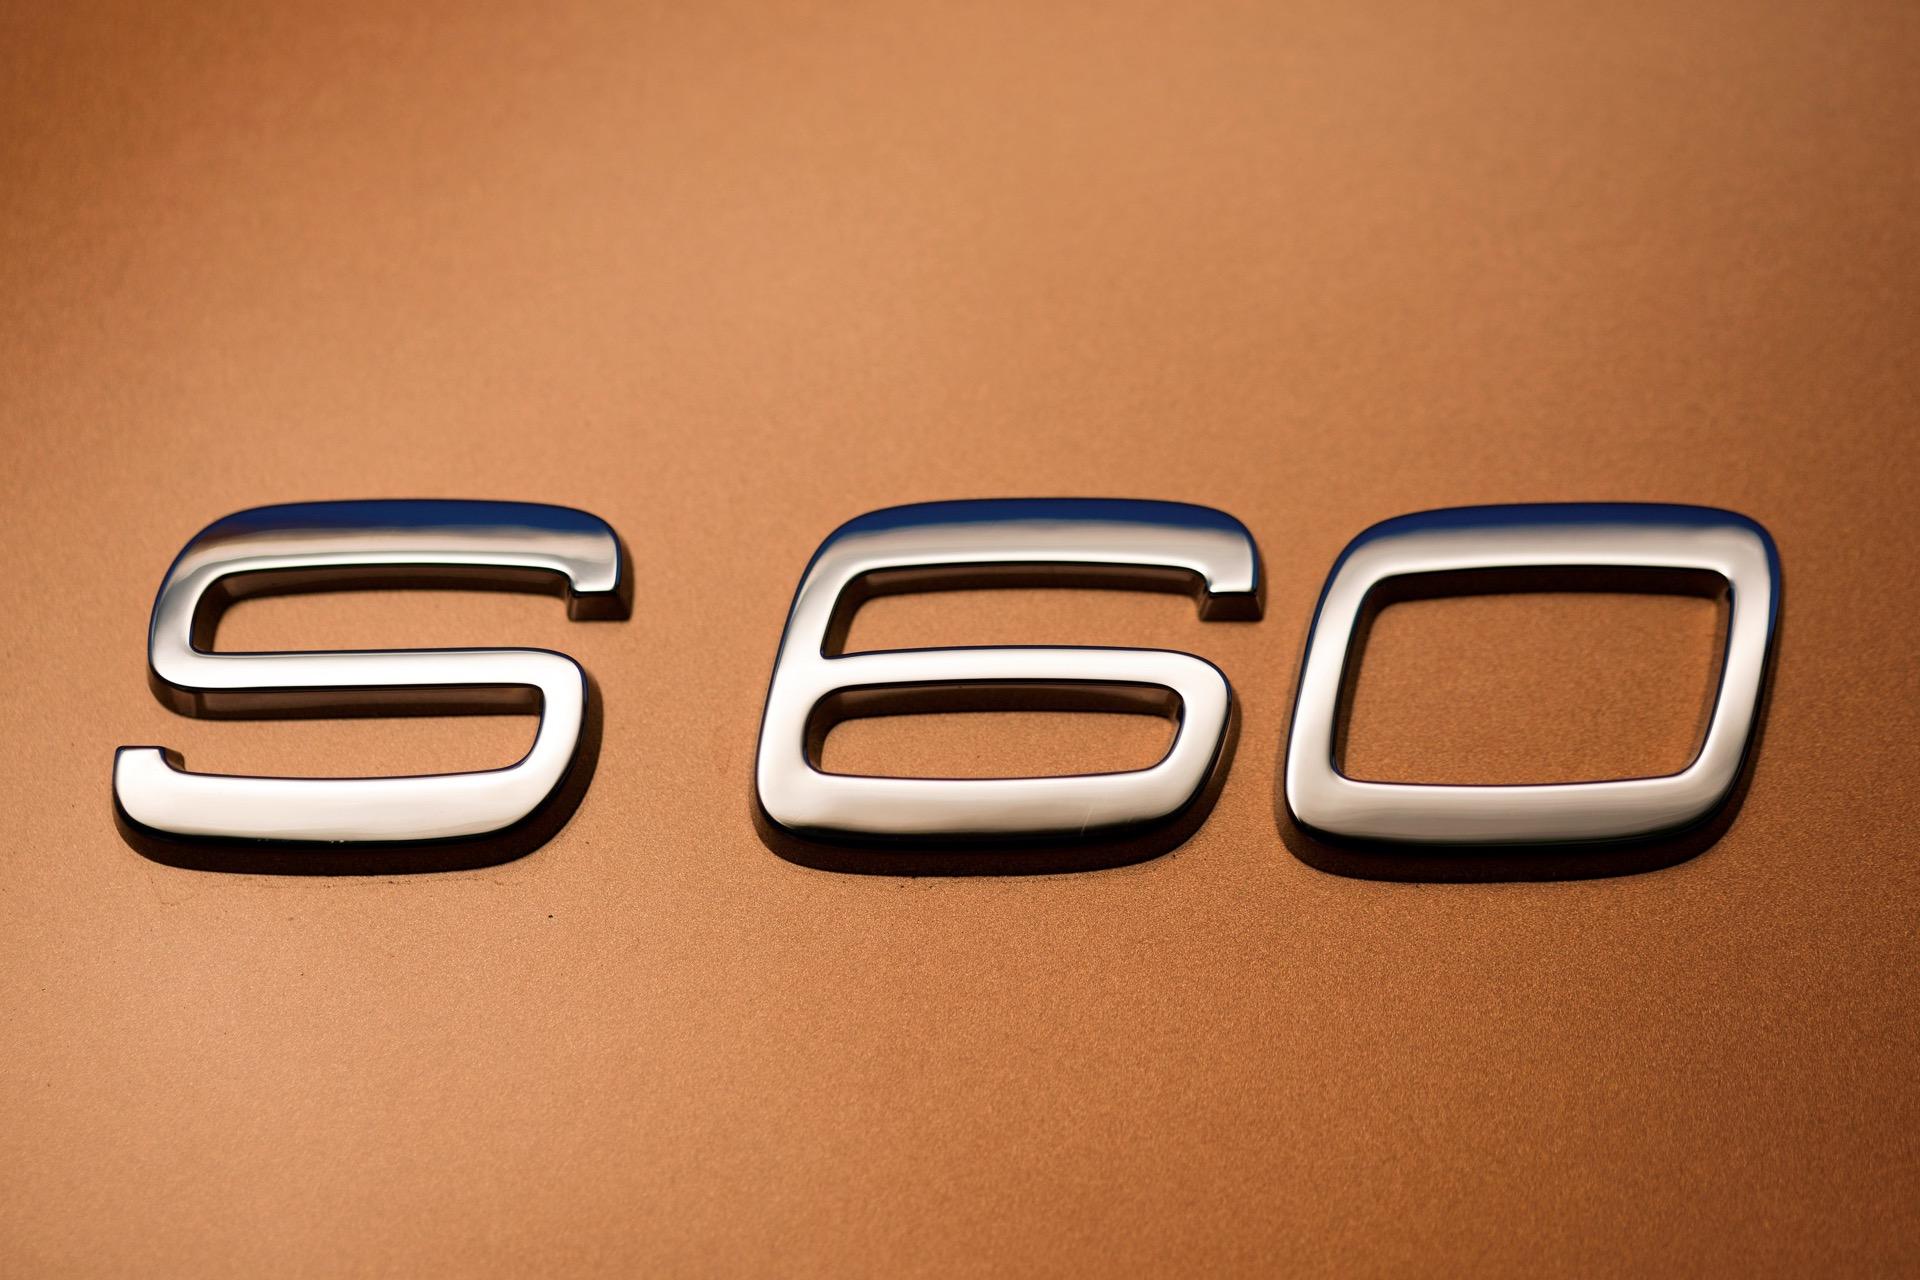 S60 T6 Awd Badge02 -  Volvo